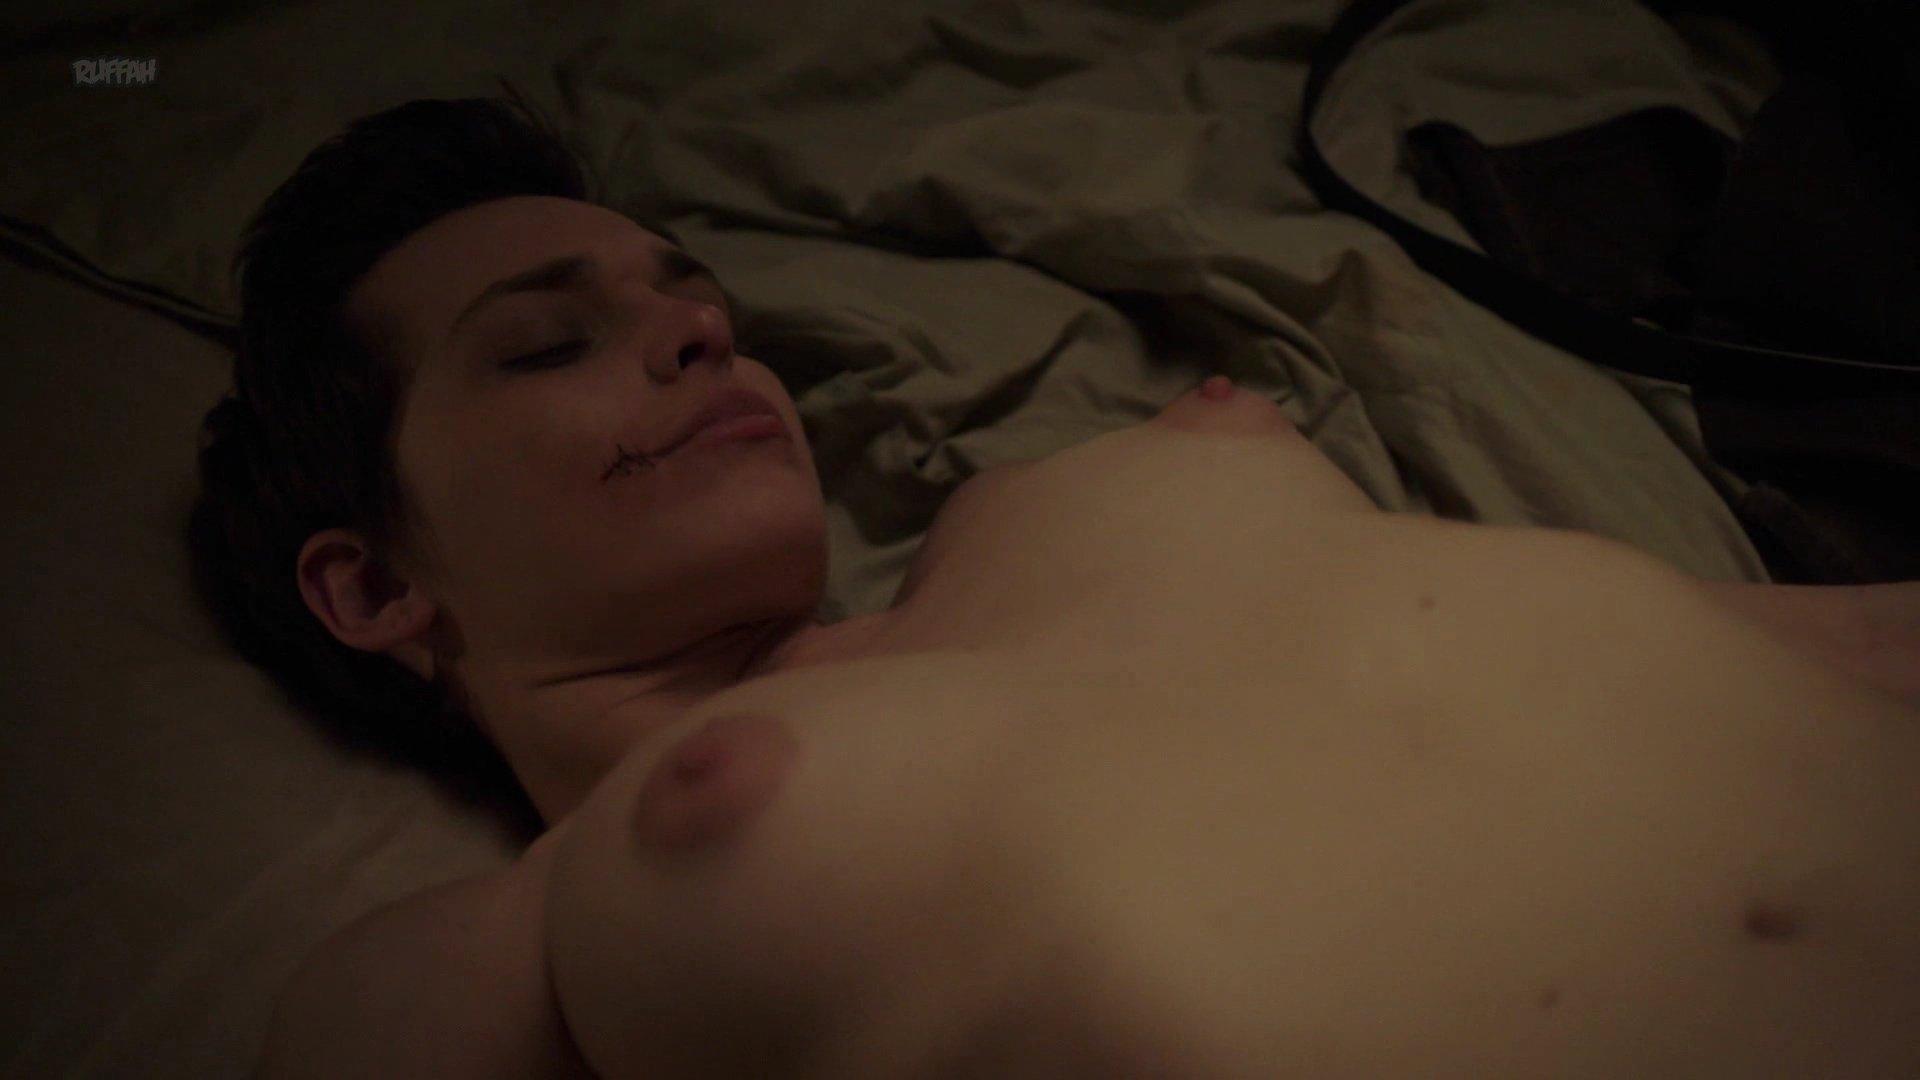 Sara Serraiocco nude, Nazanin Boniadi sexy - Counterpart s01e04 (2018)